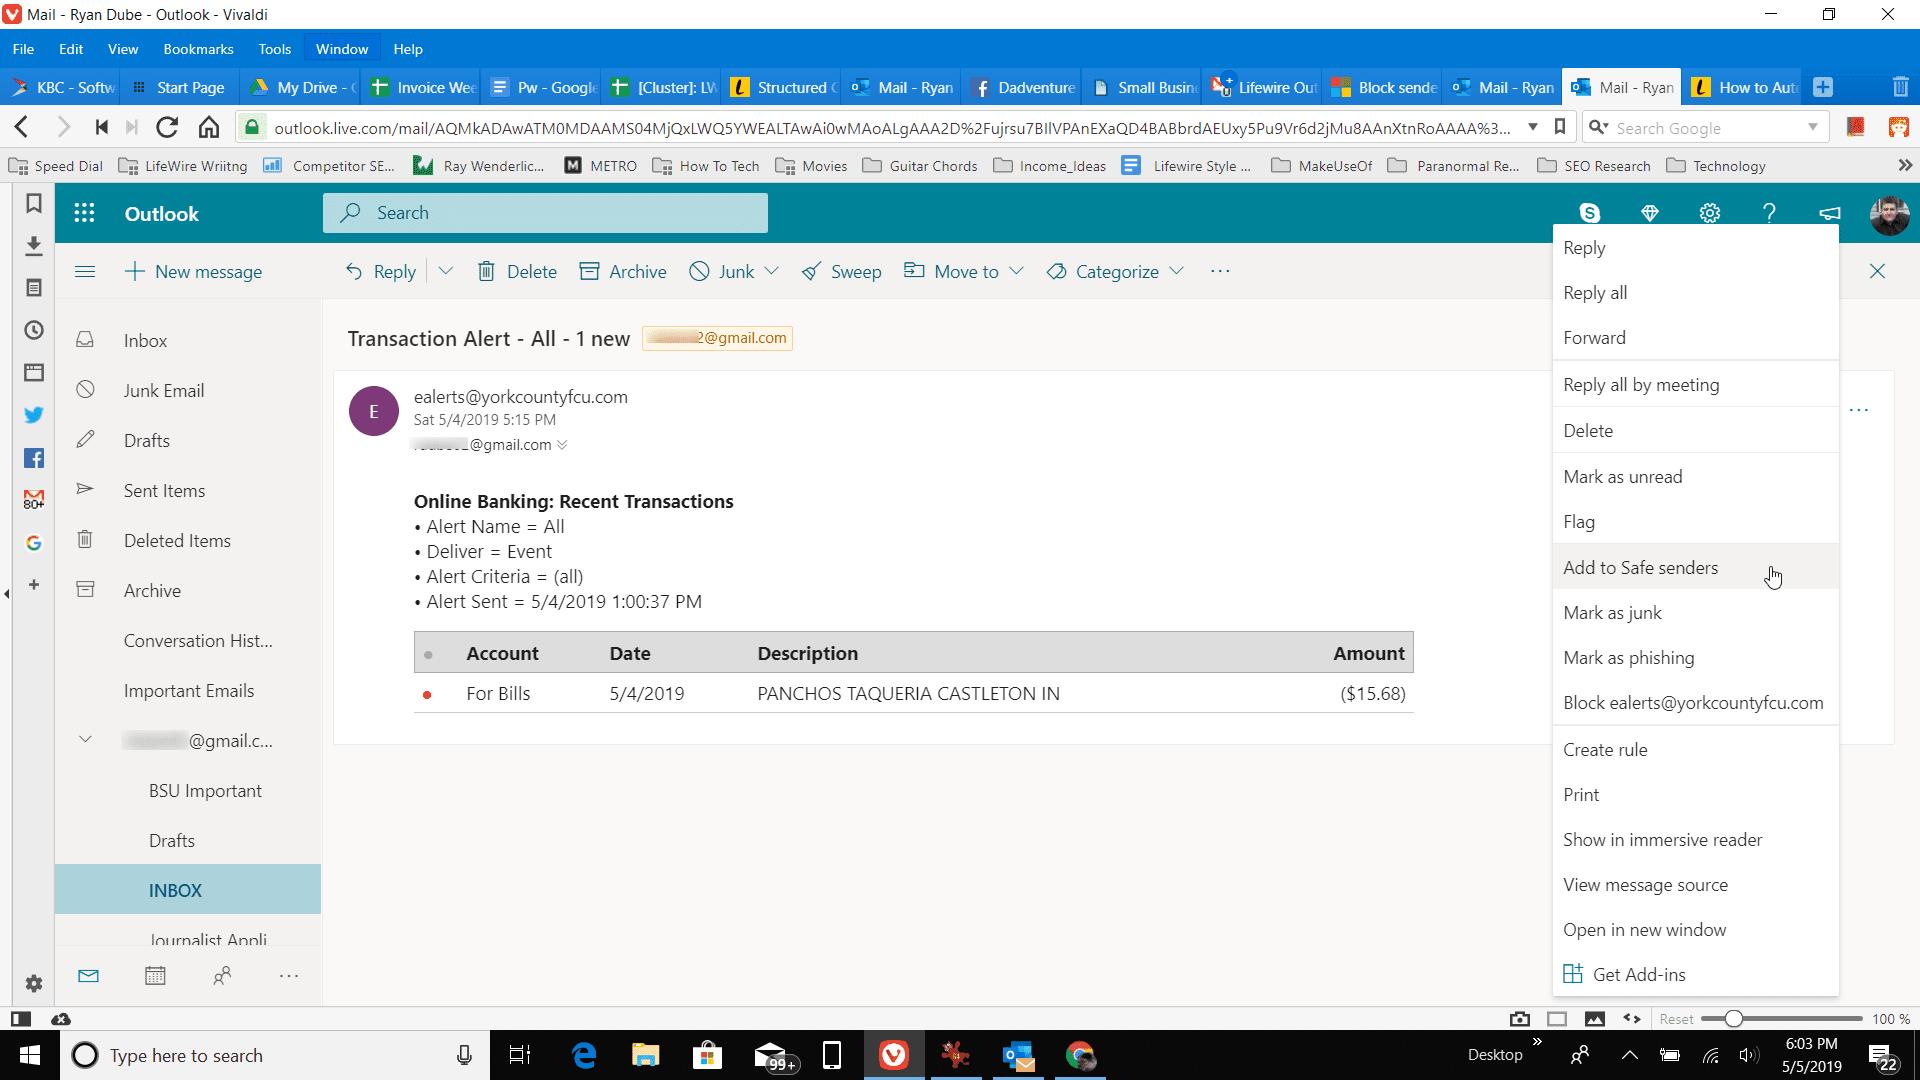 Screenshot of Add to Safe senders in Outlook online